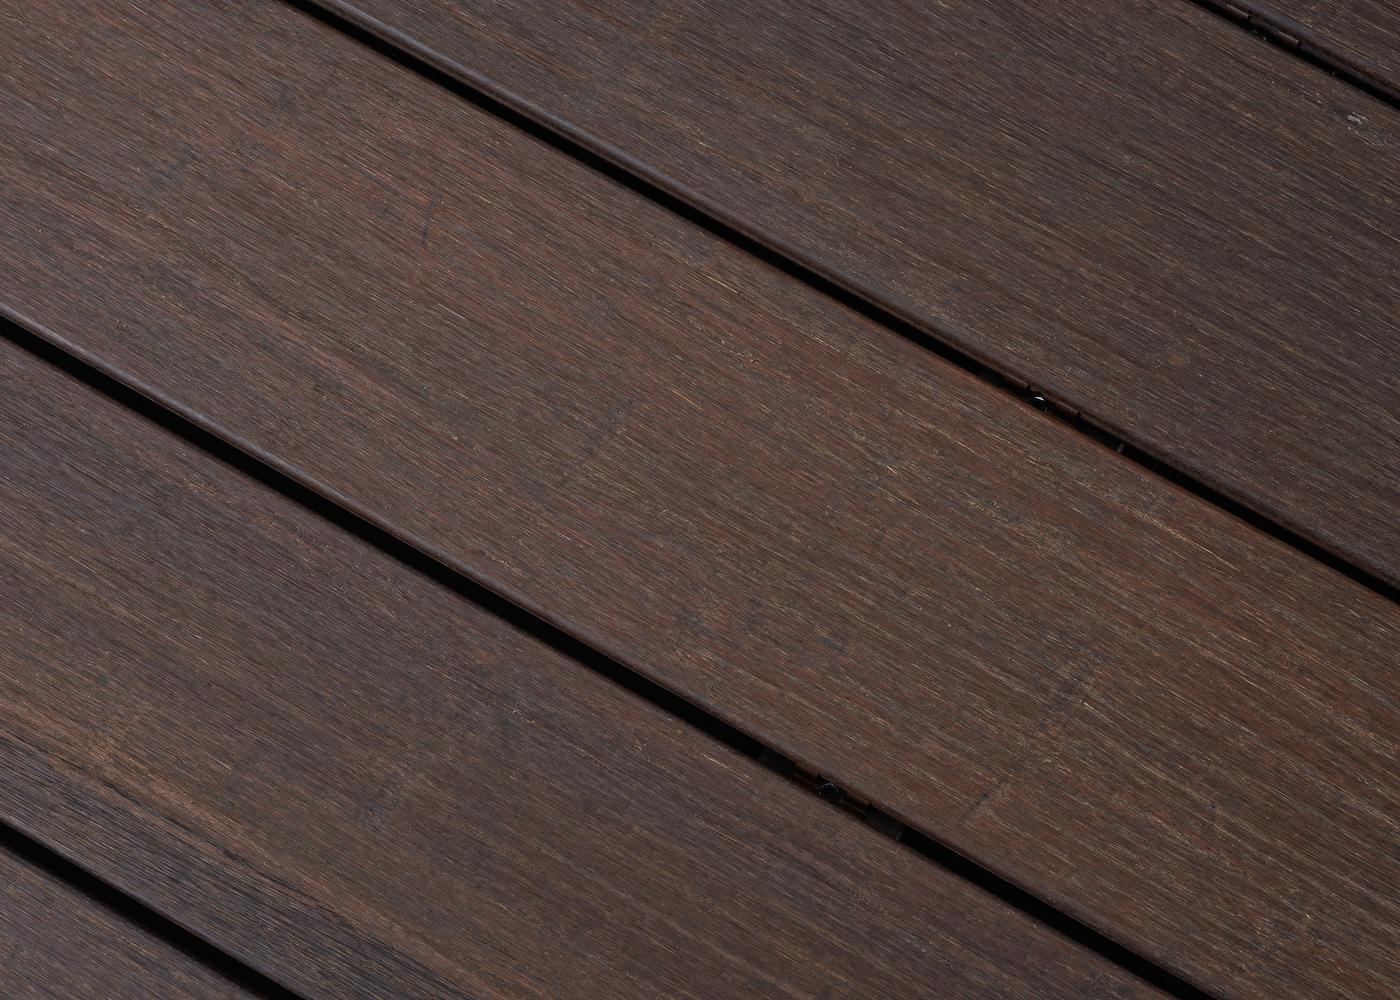 Terrase Bambou thermo-traité fixation invisible réversible 20x137x1850